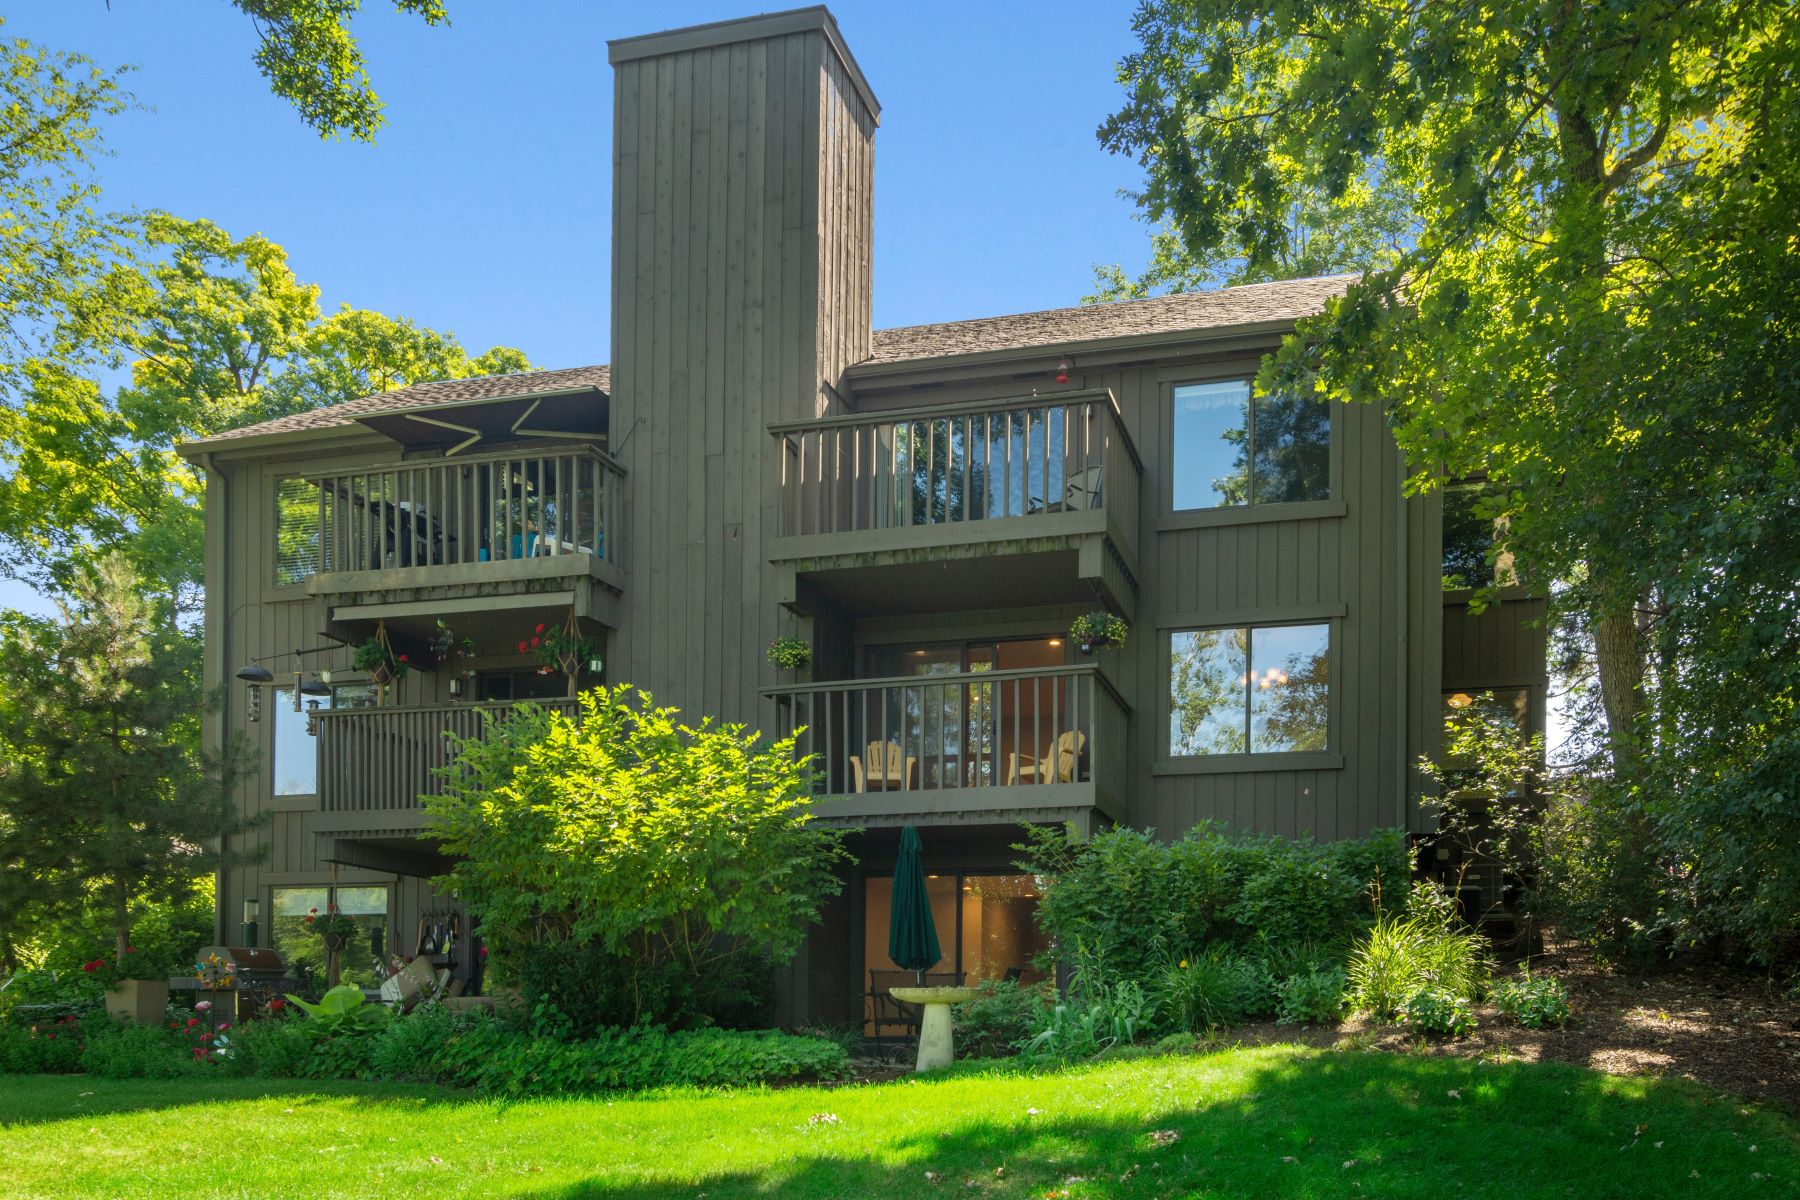 Condominiums 용 매매 에 Stunning Barrington Condo 310 Hilltop Court Unit C, Lake Barrington, 일리노이즈 60010 미국